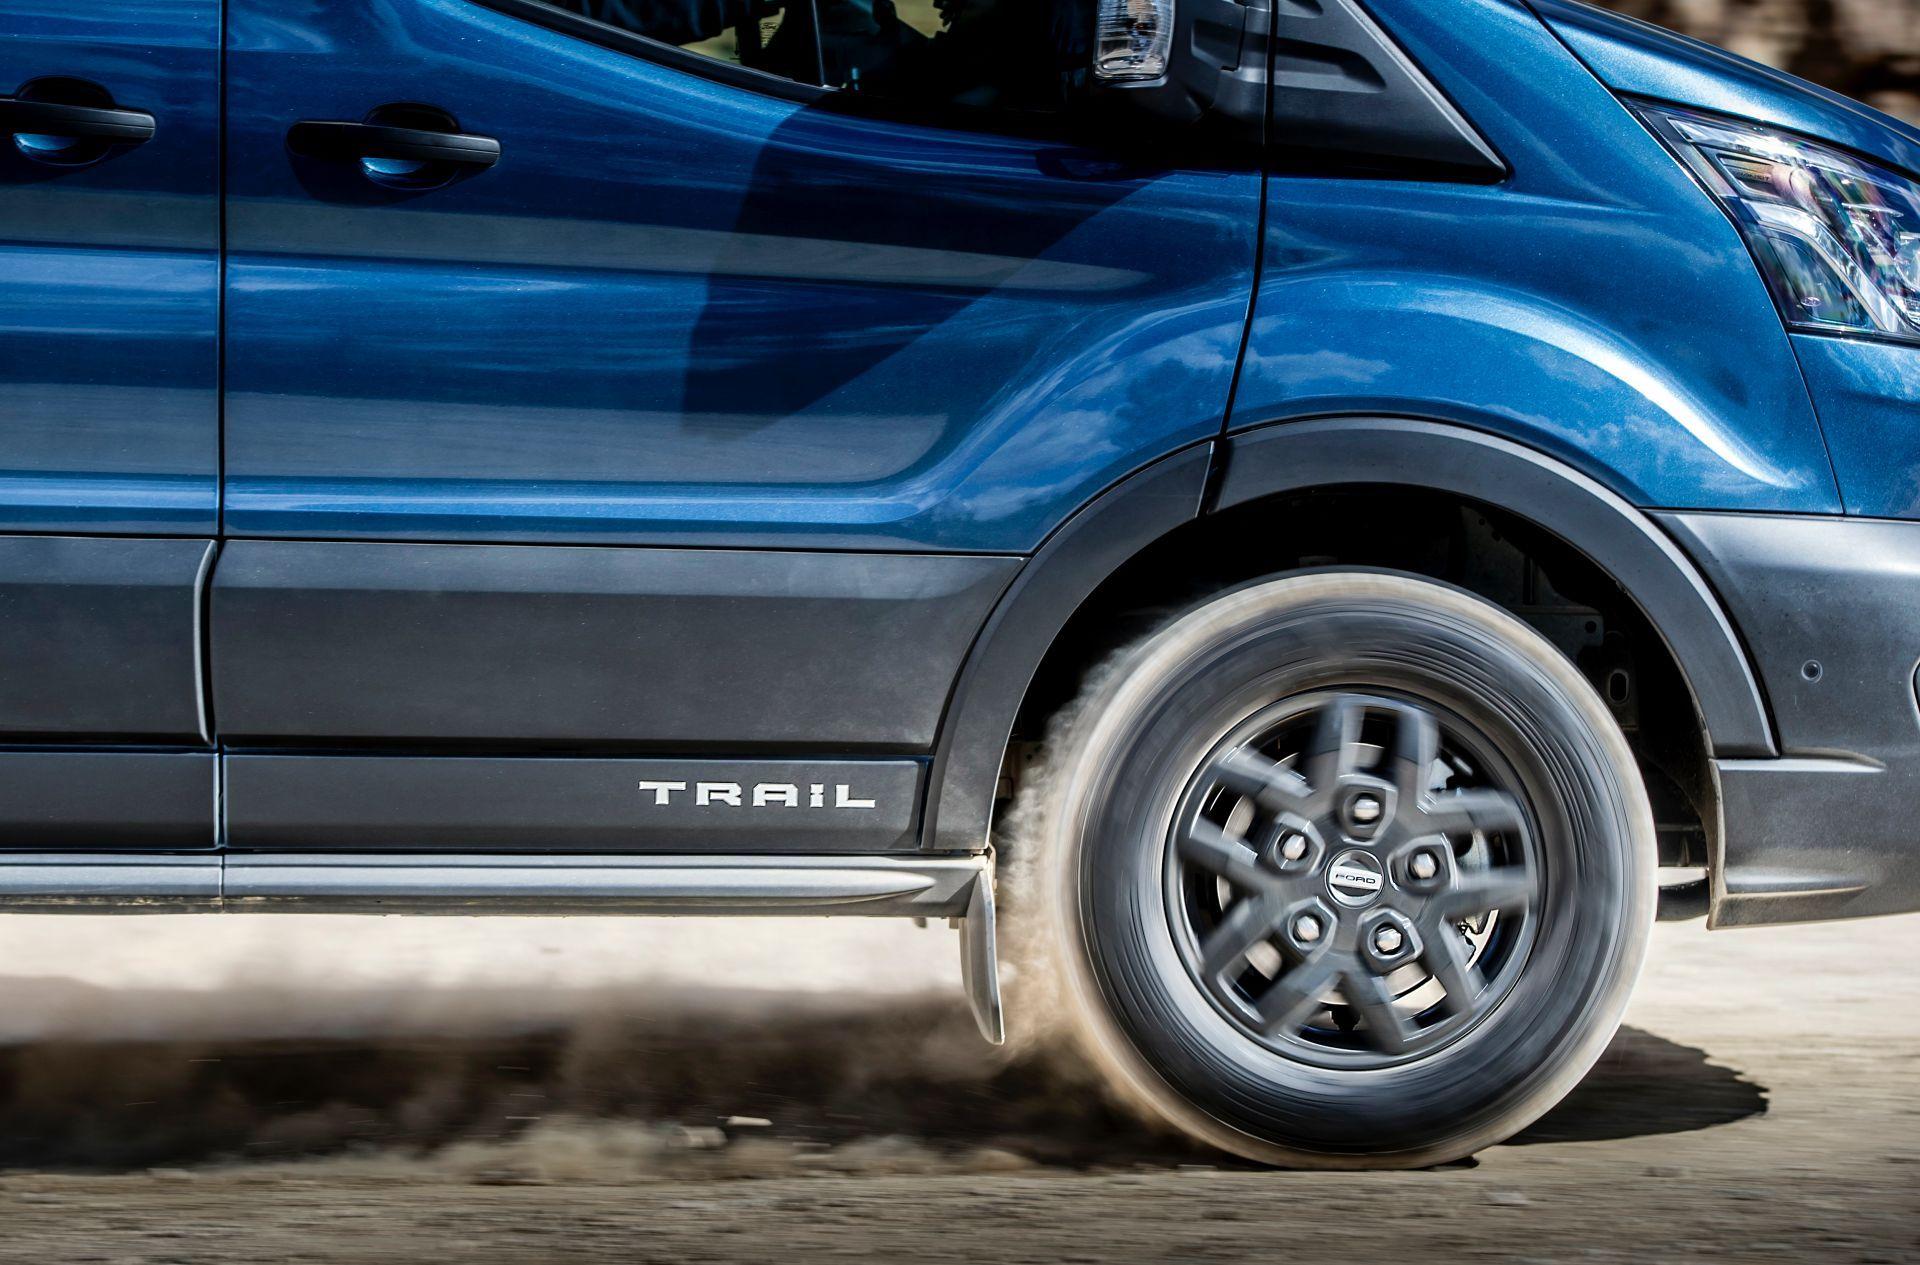 2021-Ford-Transit-Trail-Euro-spec-11